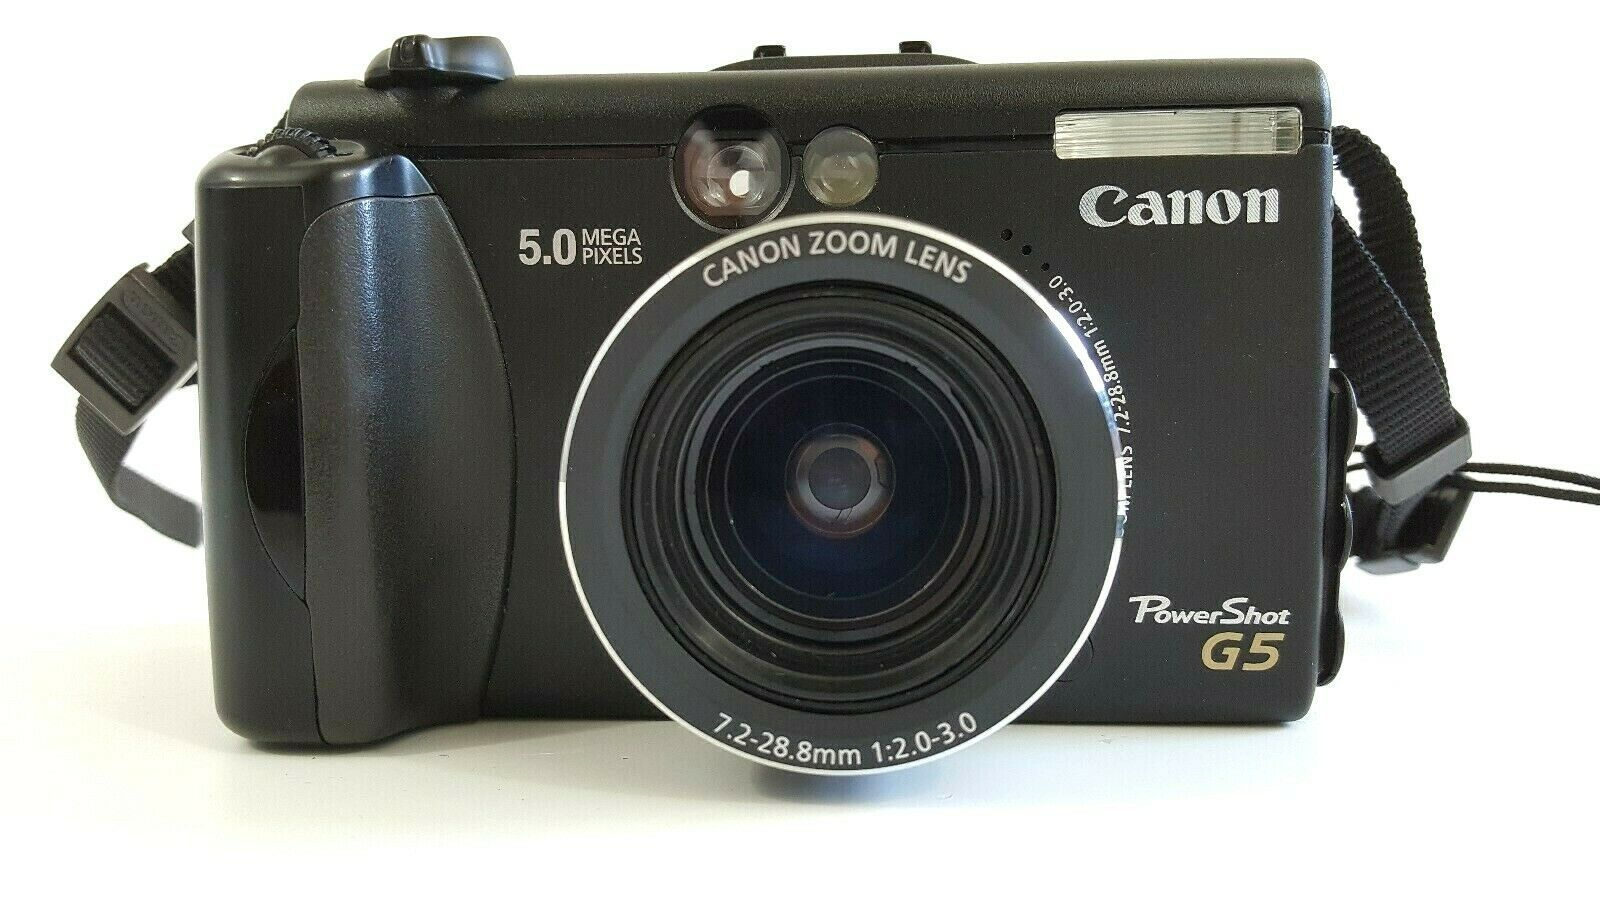 Canon PowerShot G5 5.0MP Digital Camera Black All Parts